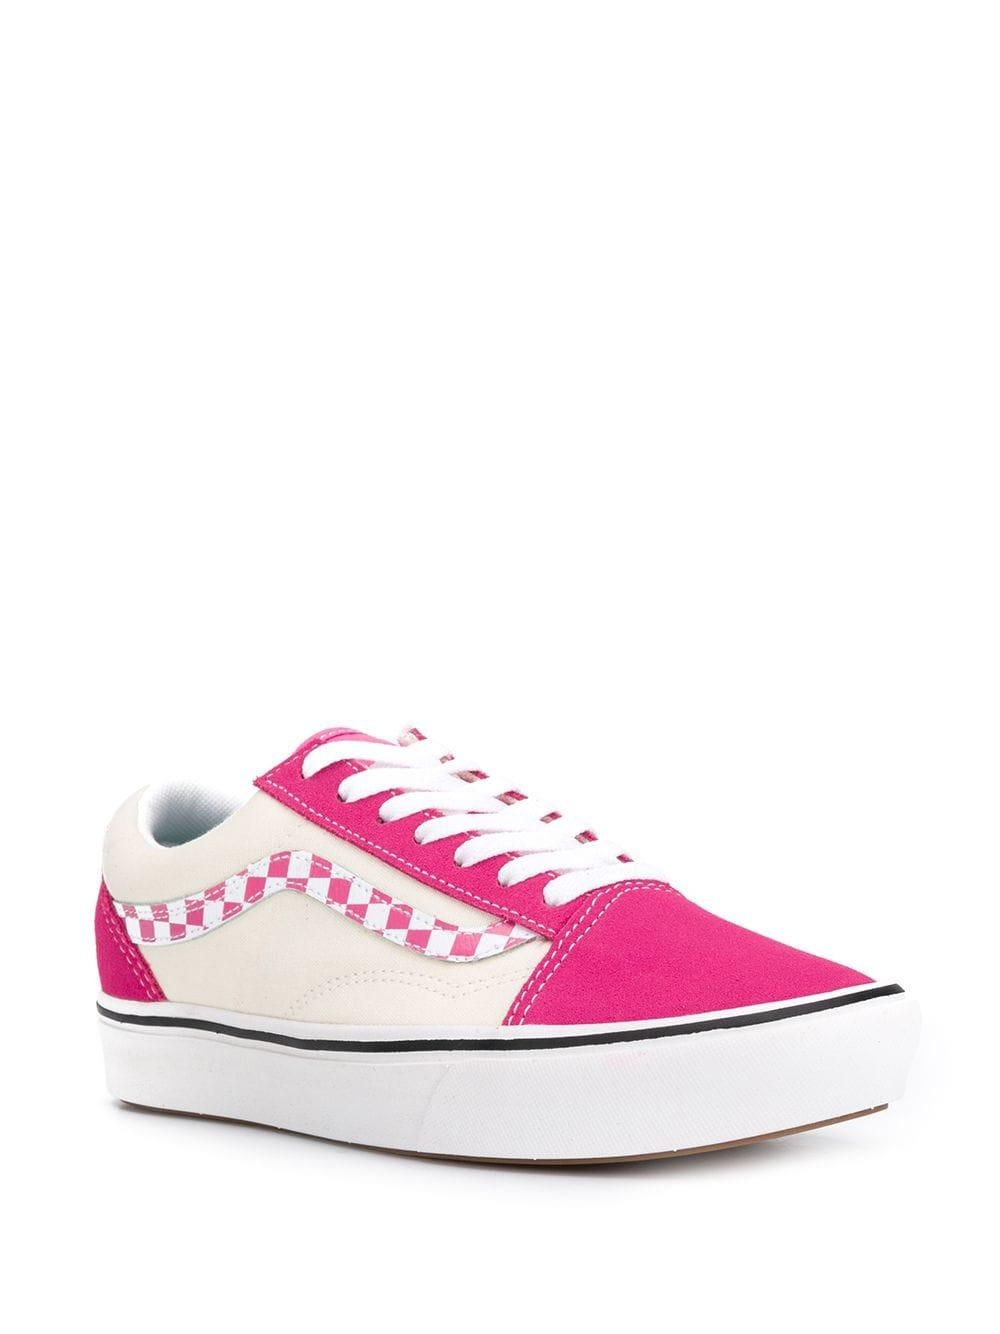 fa9b50f9b3f0 Vans Confycush Old Skool Sneakers in Pink - Lyst